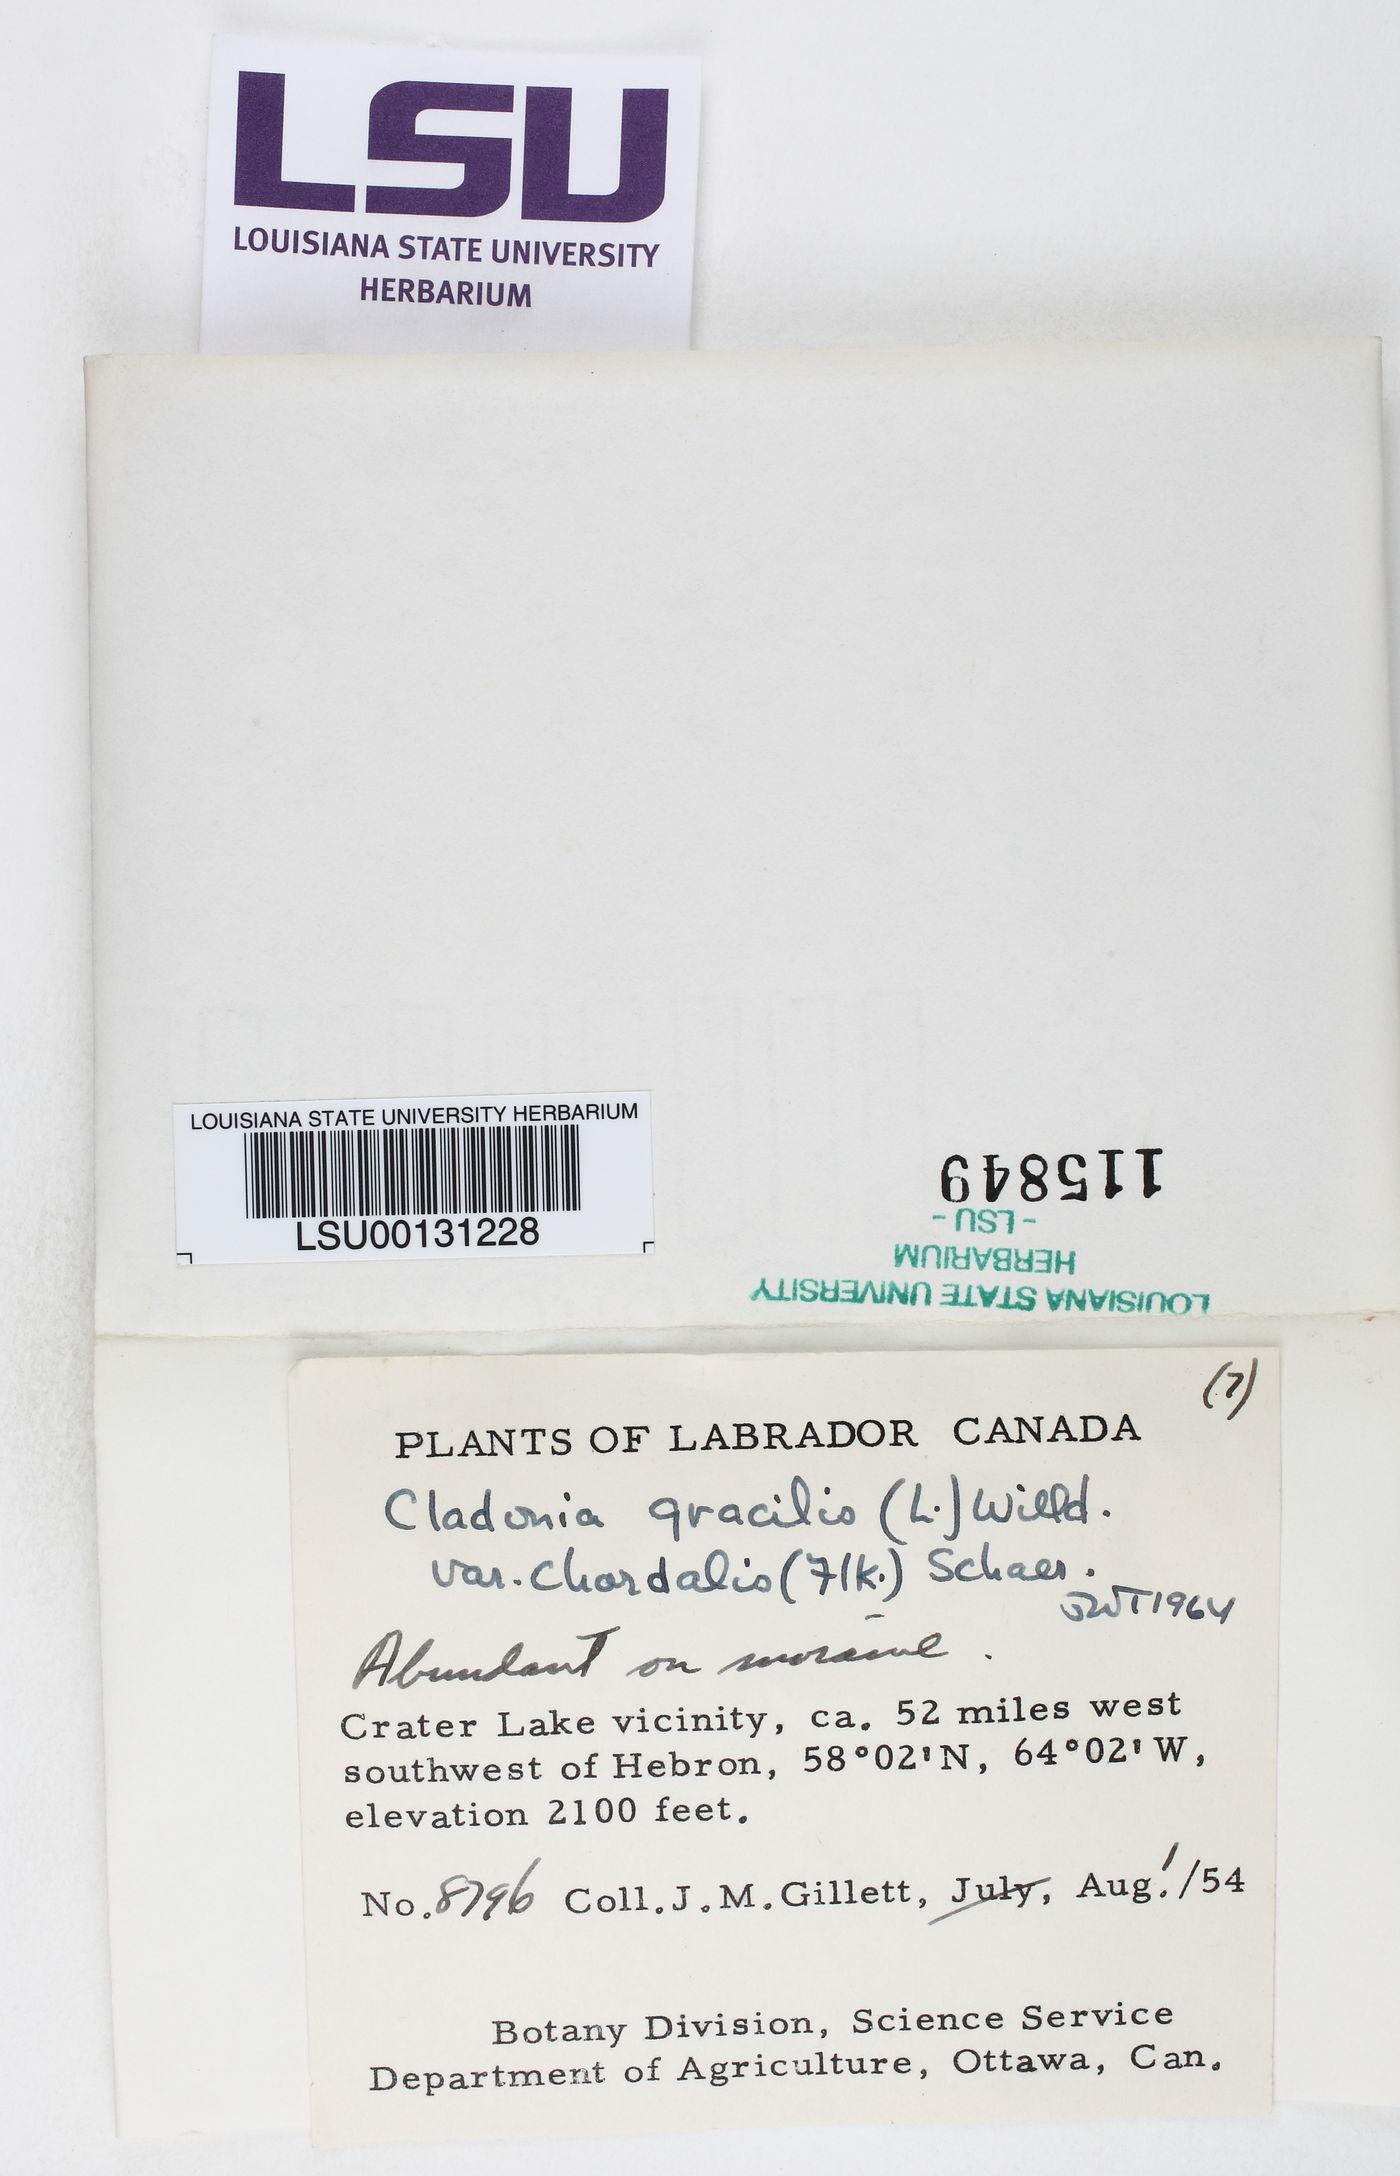 Cladonia gracilis var. chordalis image